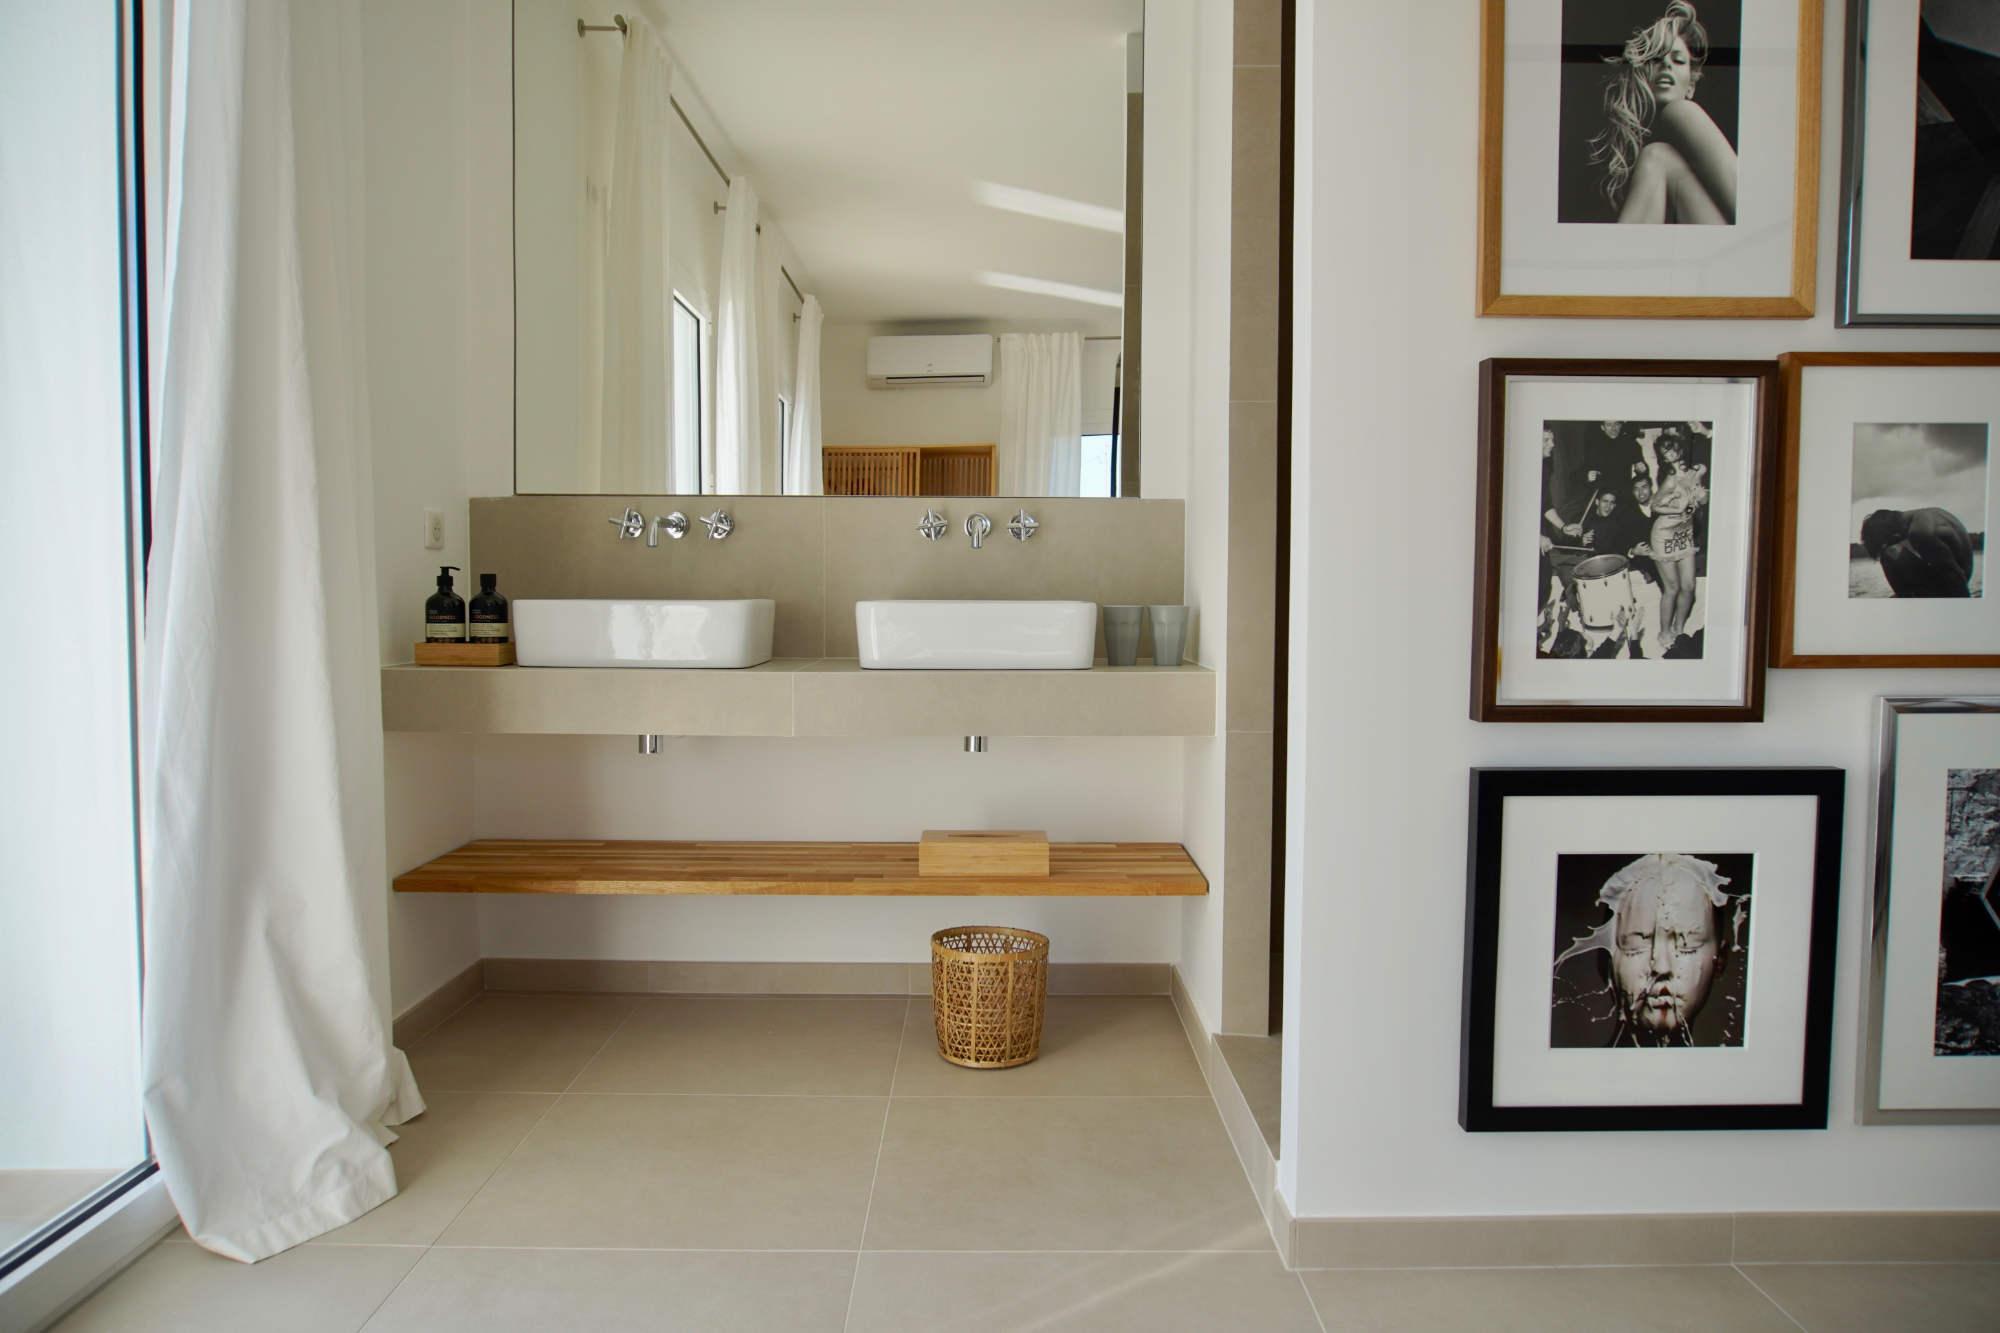 Villa d'Arte French Riviera Bathroom